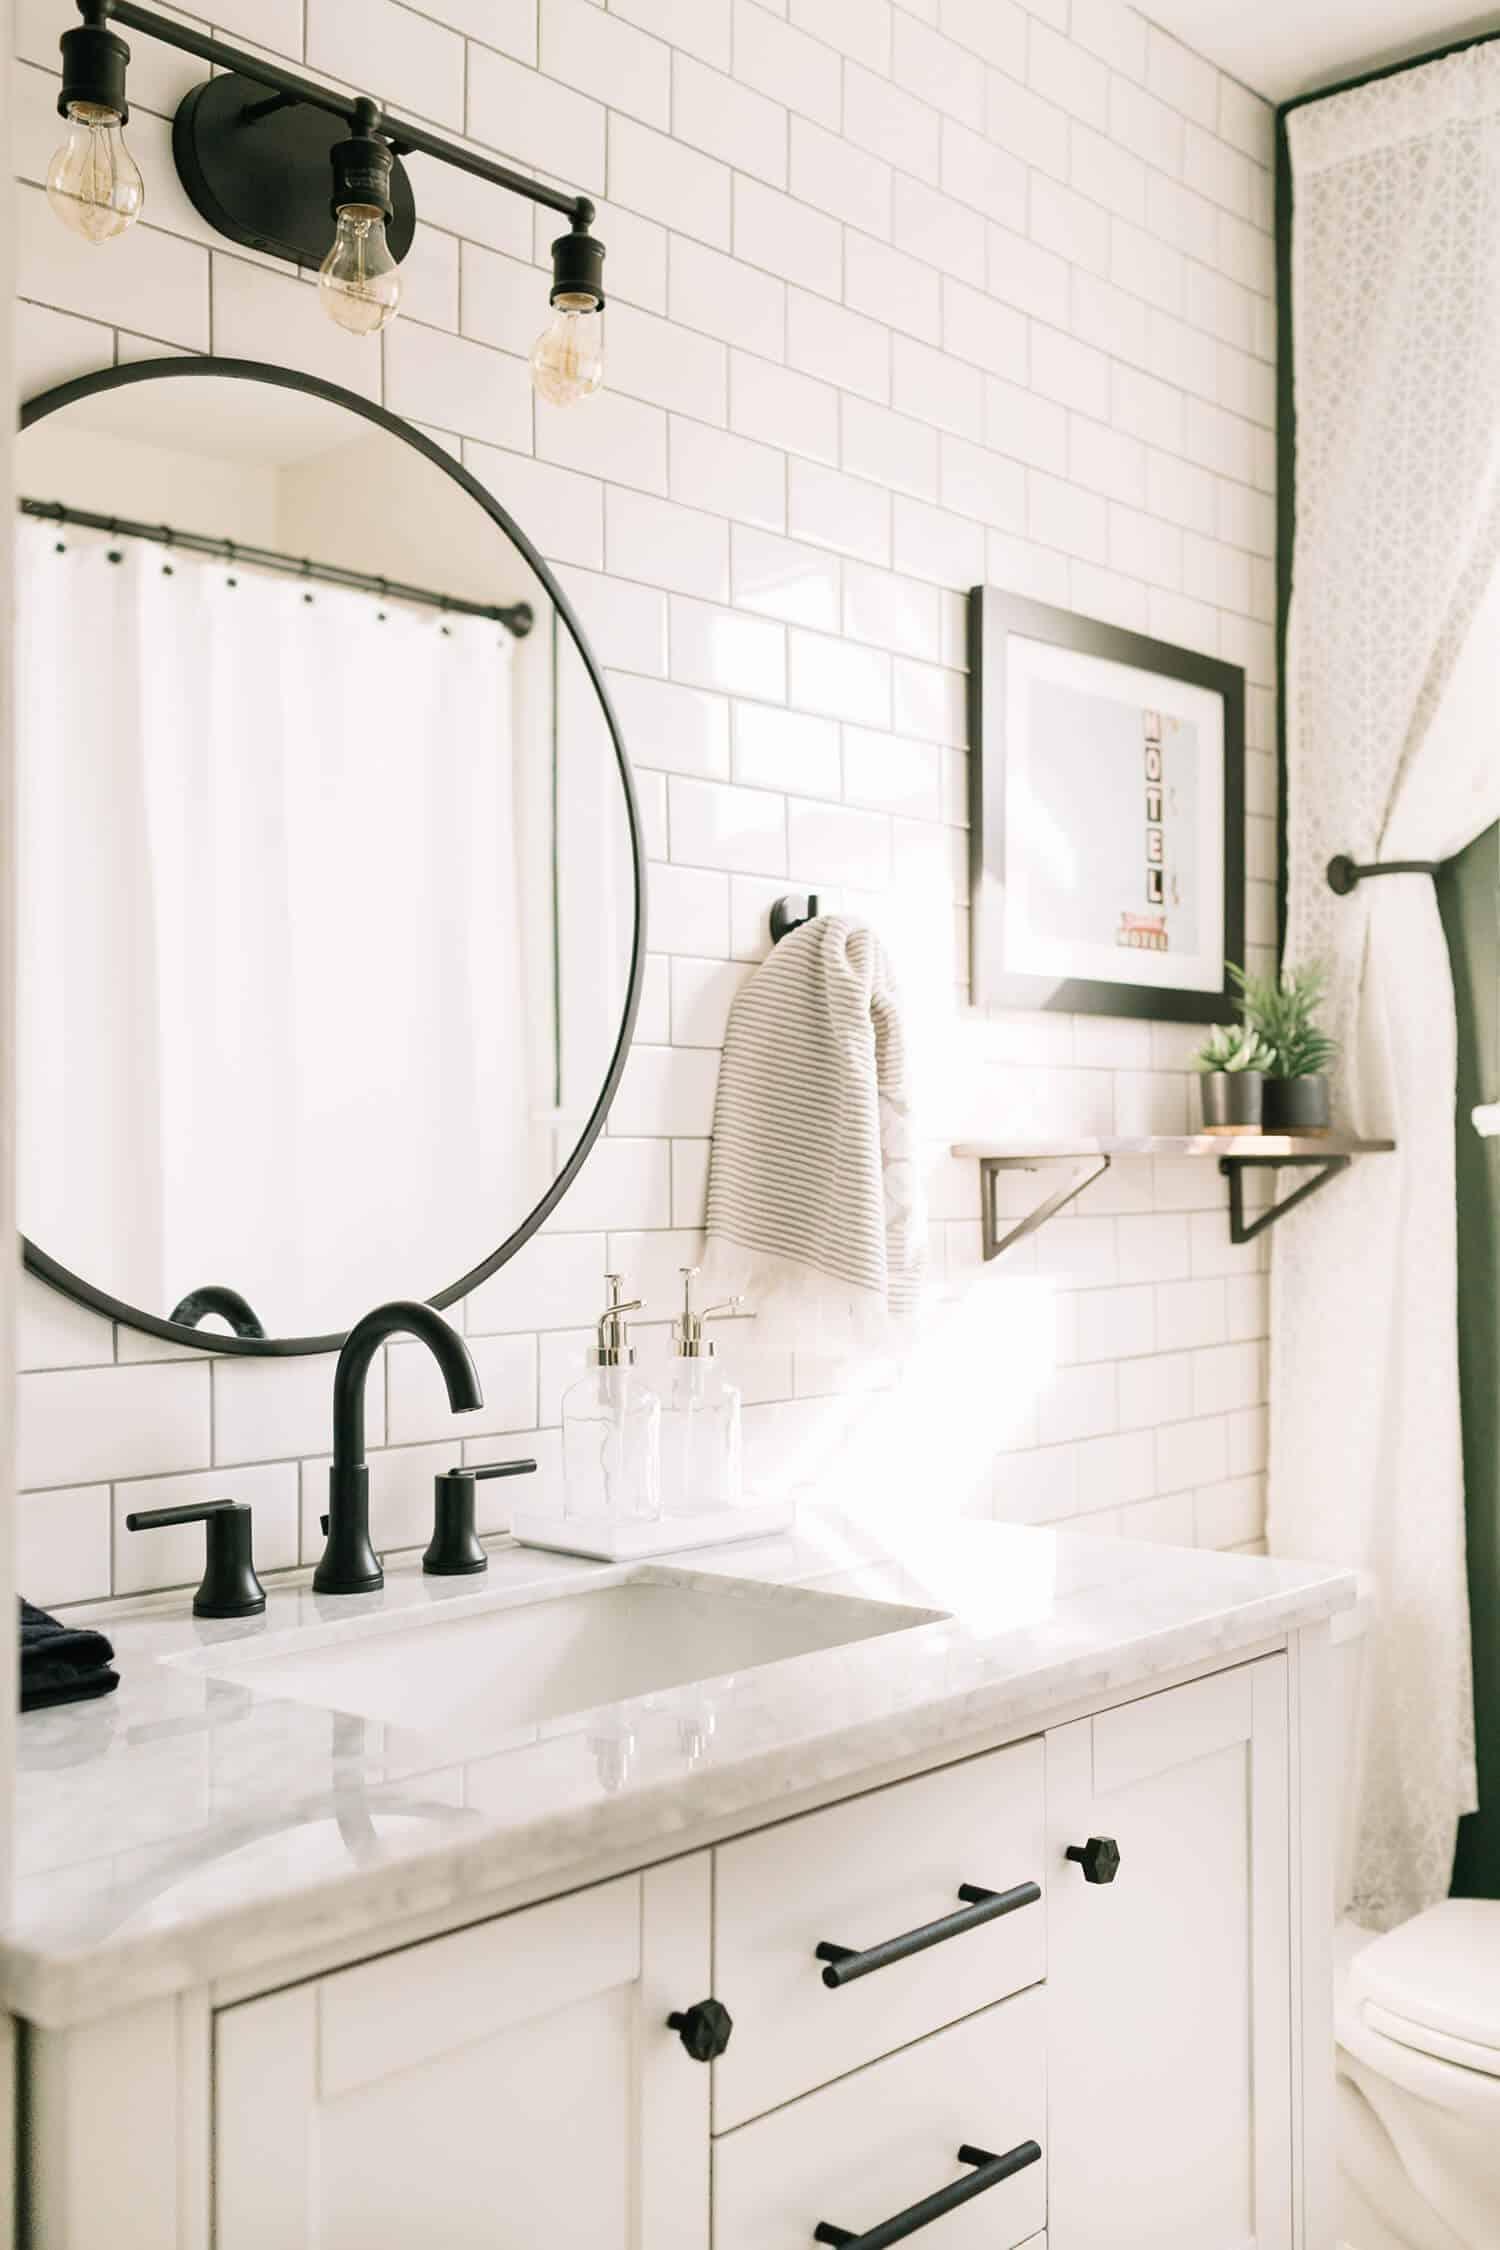 Elsiesnashvillebnb Bathroom Tour (Before + After) - A Beautiful Mess